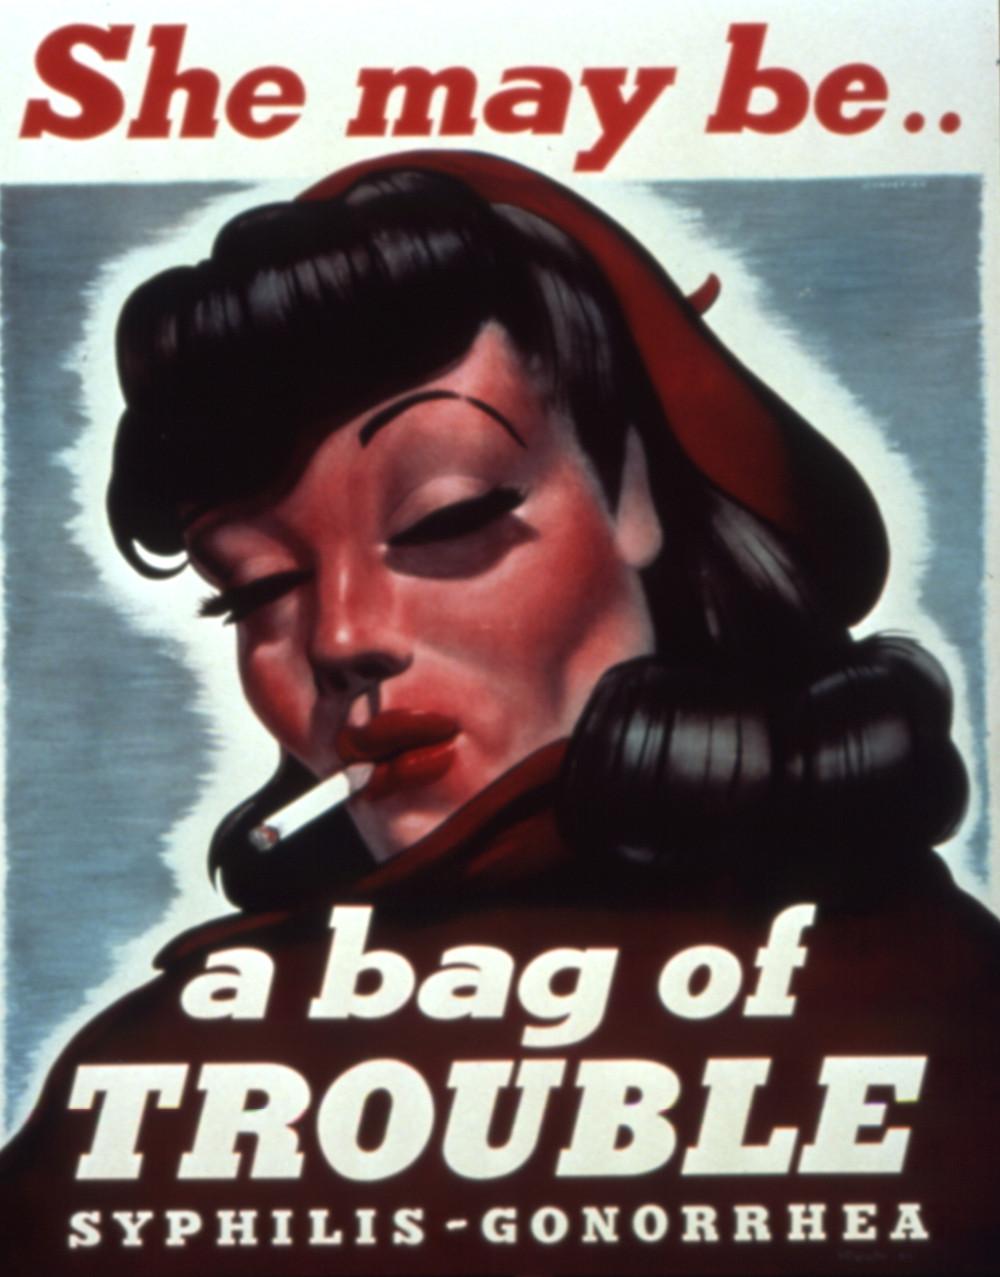 WWII anti-venereal disease poster- bag of trouble